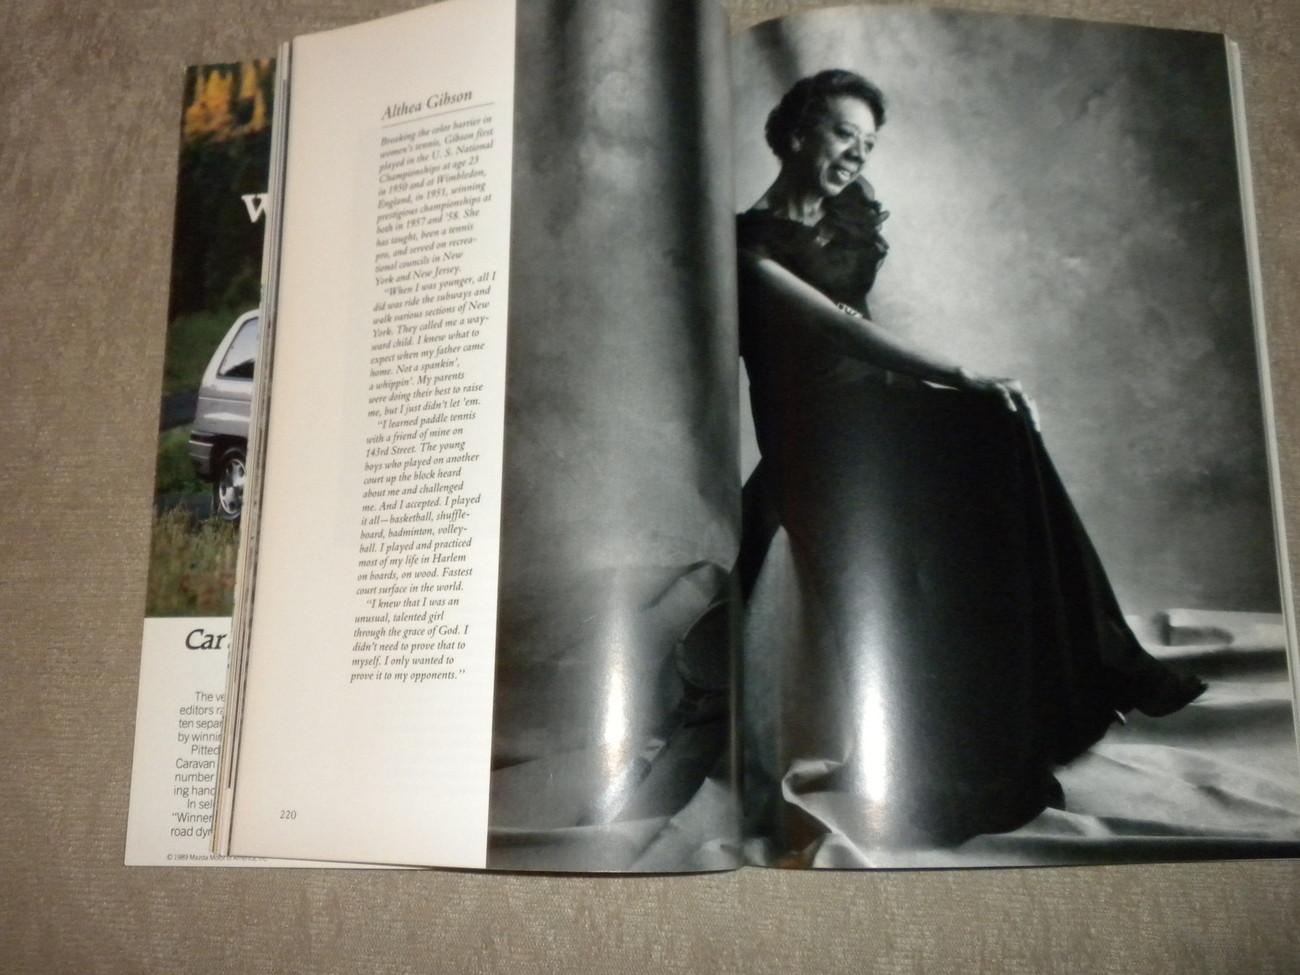 America's Black Women, Havana Cuba, Oil, Elephants, CA  National Geographic 1989